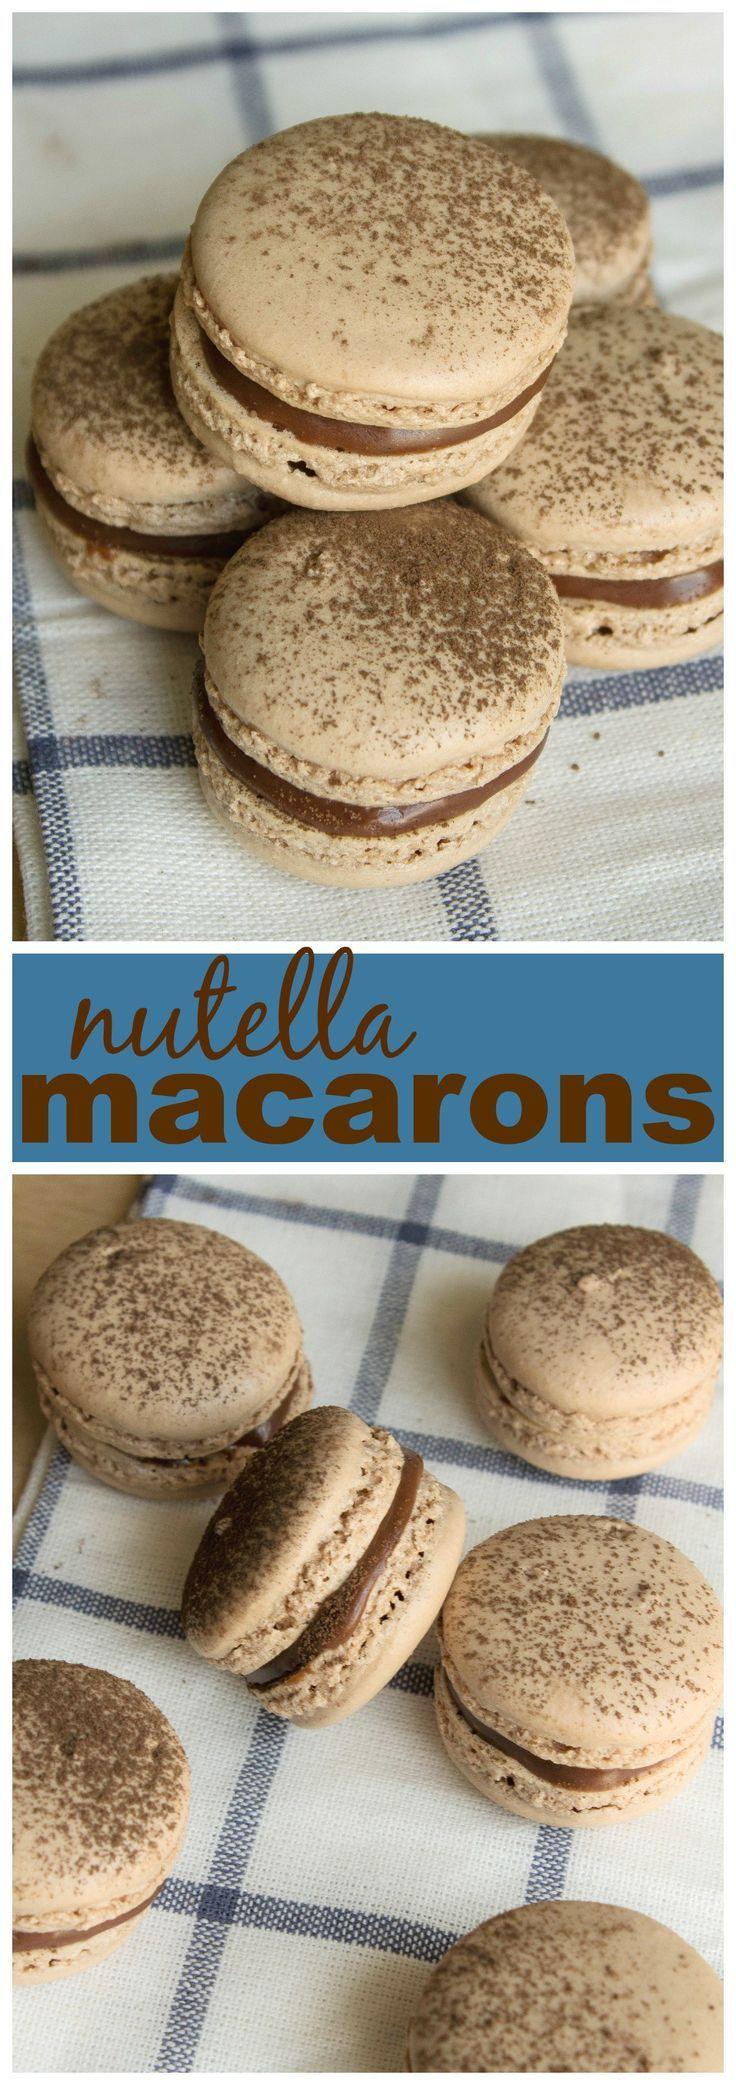 Nutella Macarons                                                                                                                                                                                 More